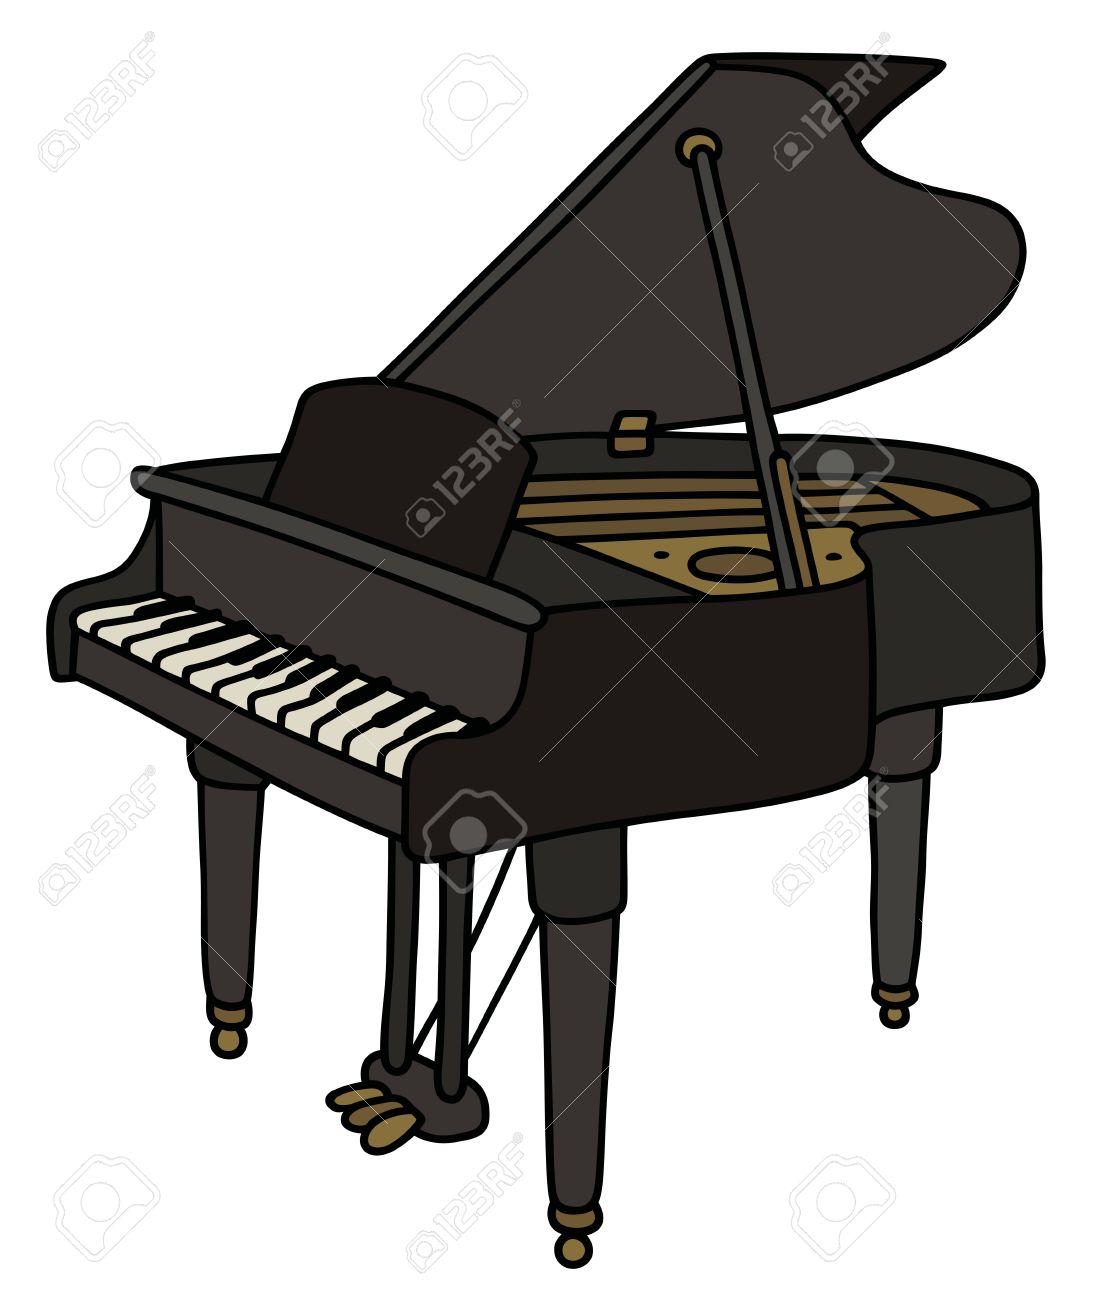 Dessin De Piano hand drawing of a classic black grand piano royalty free cliparts